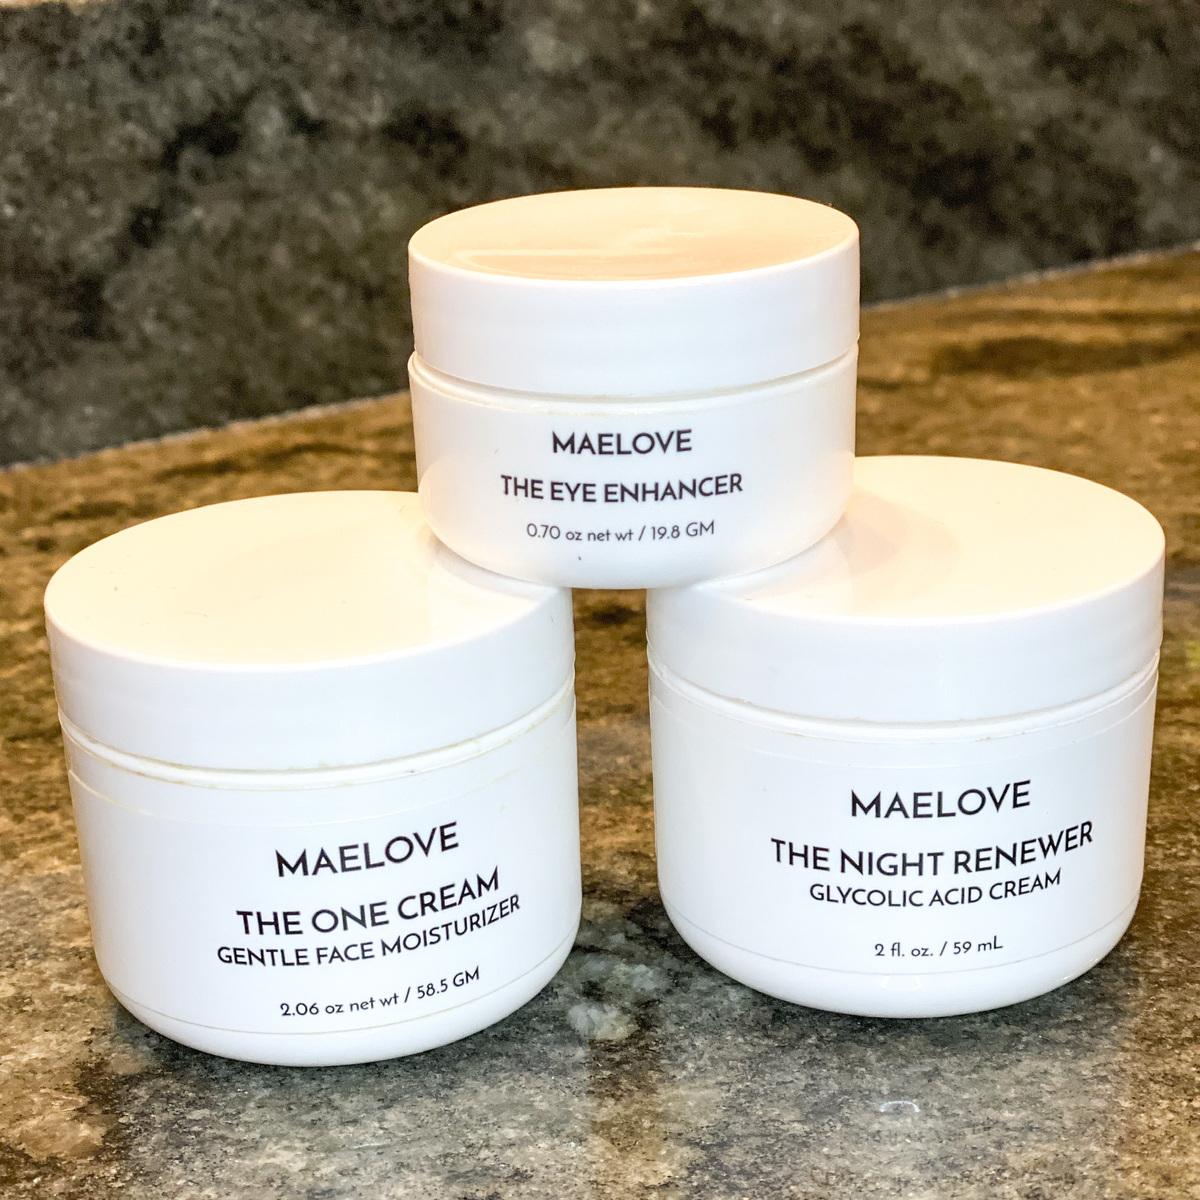 maelove skincare lotions on green granite countertop